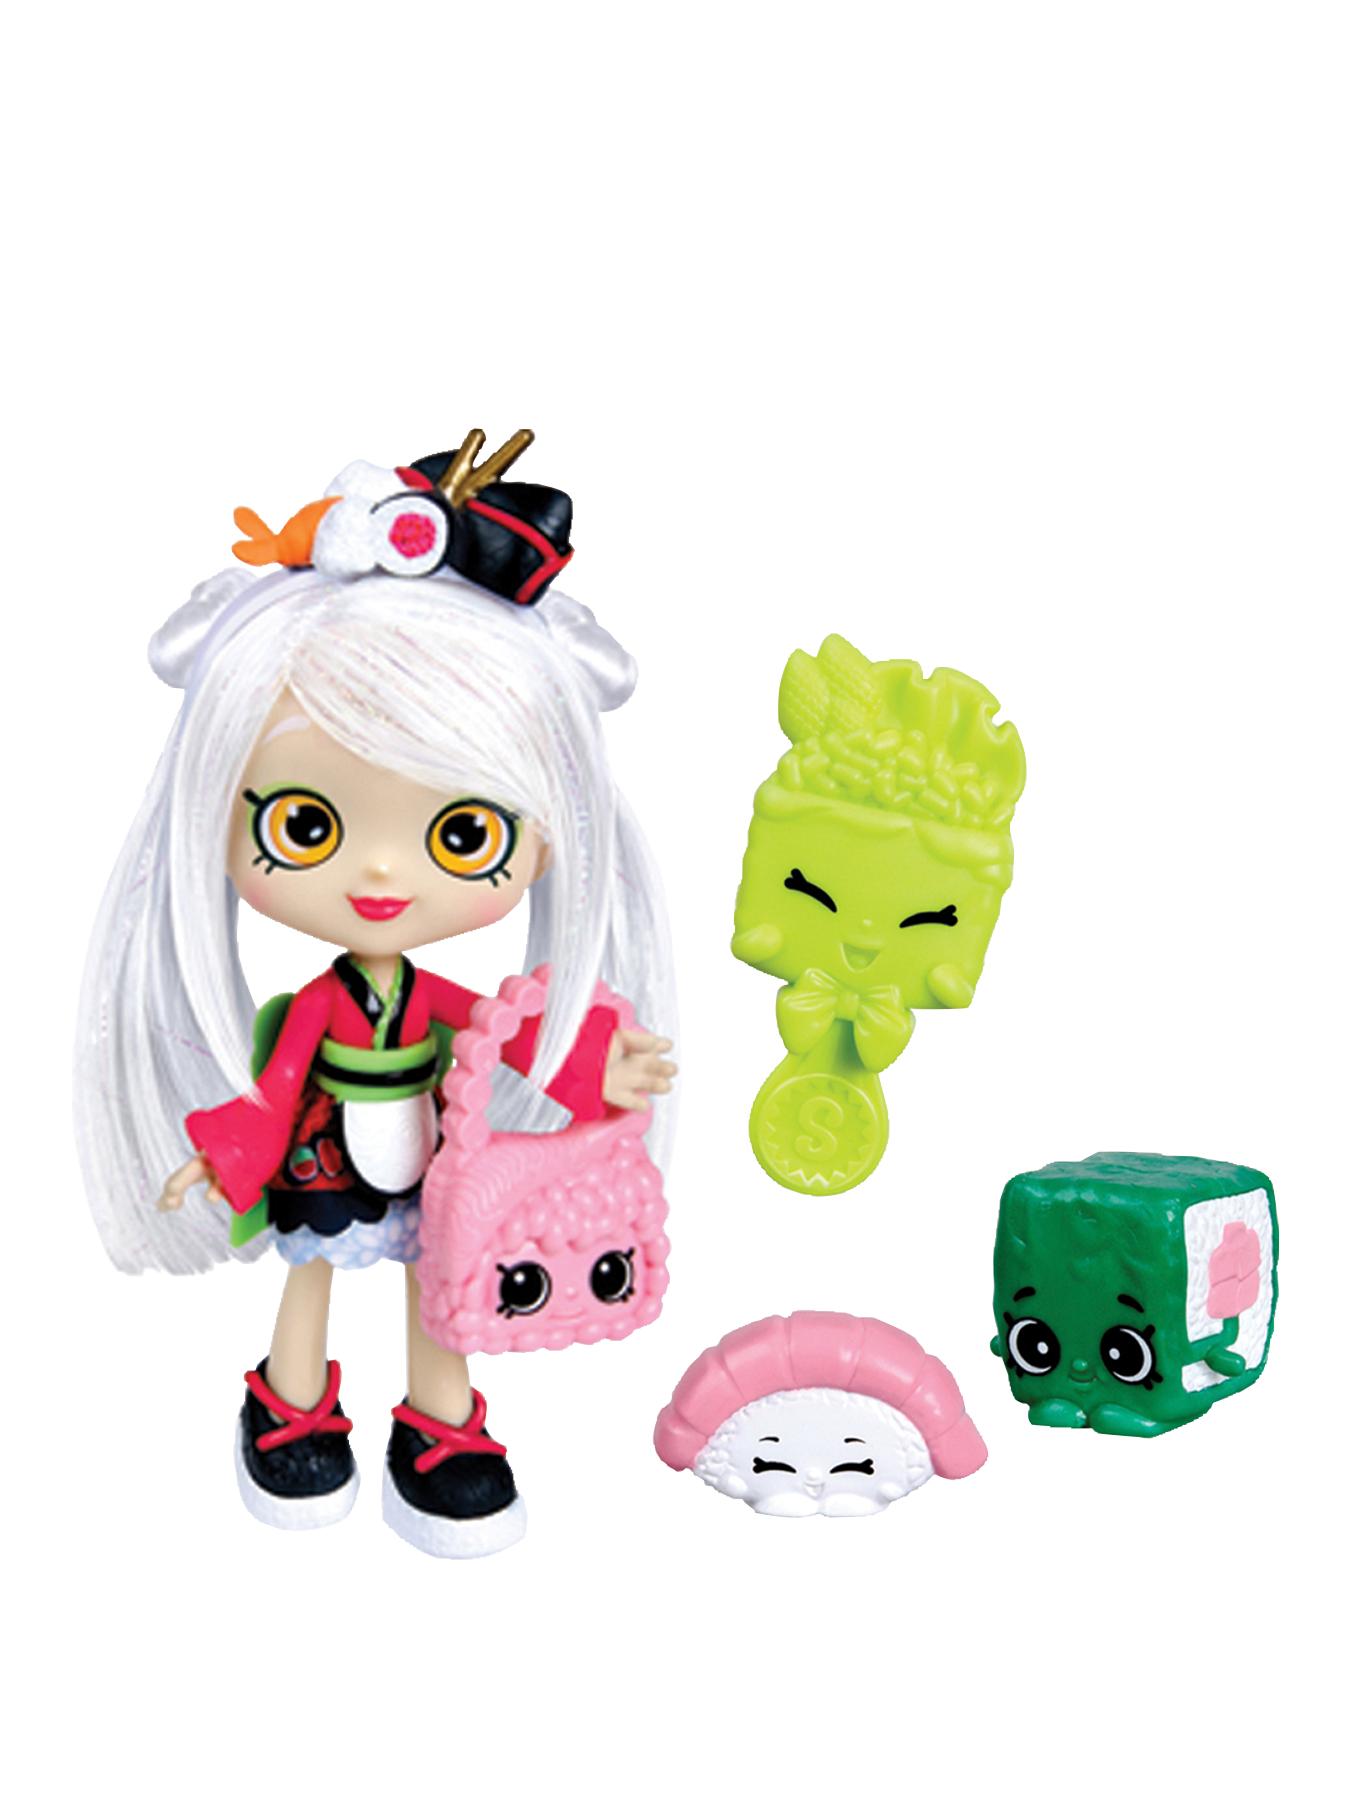 Doll clipart shoppie. Shopkins shoppies dolls sara